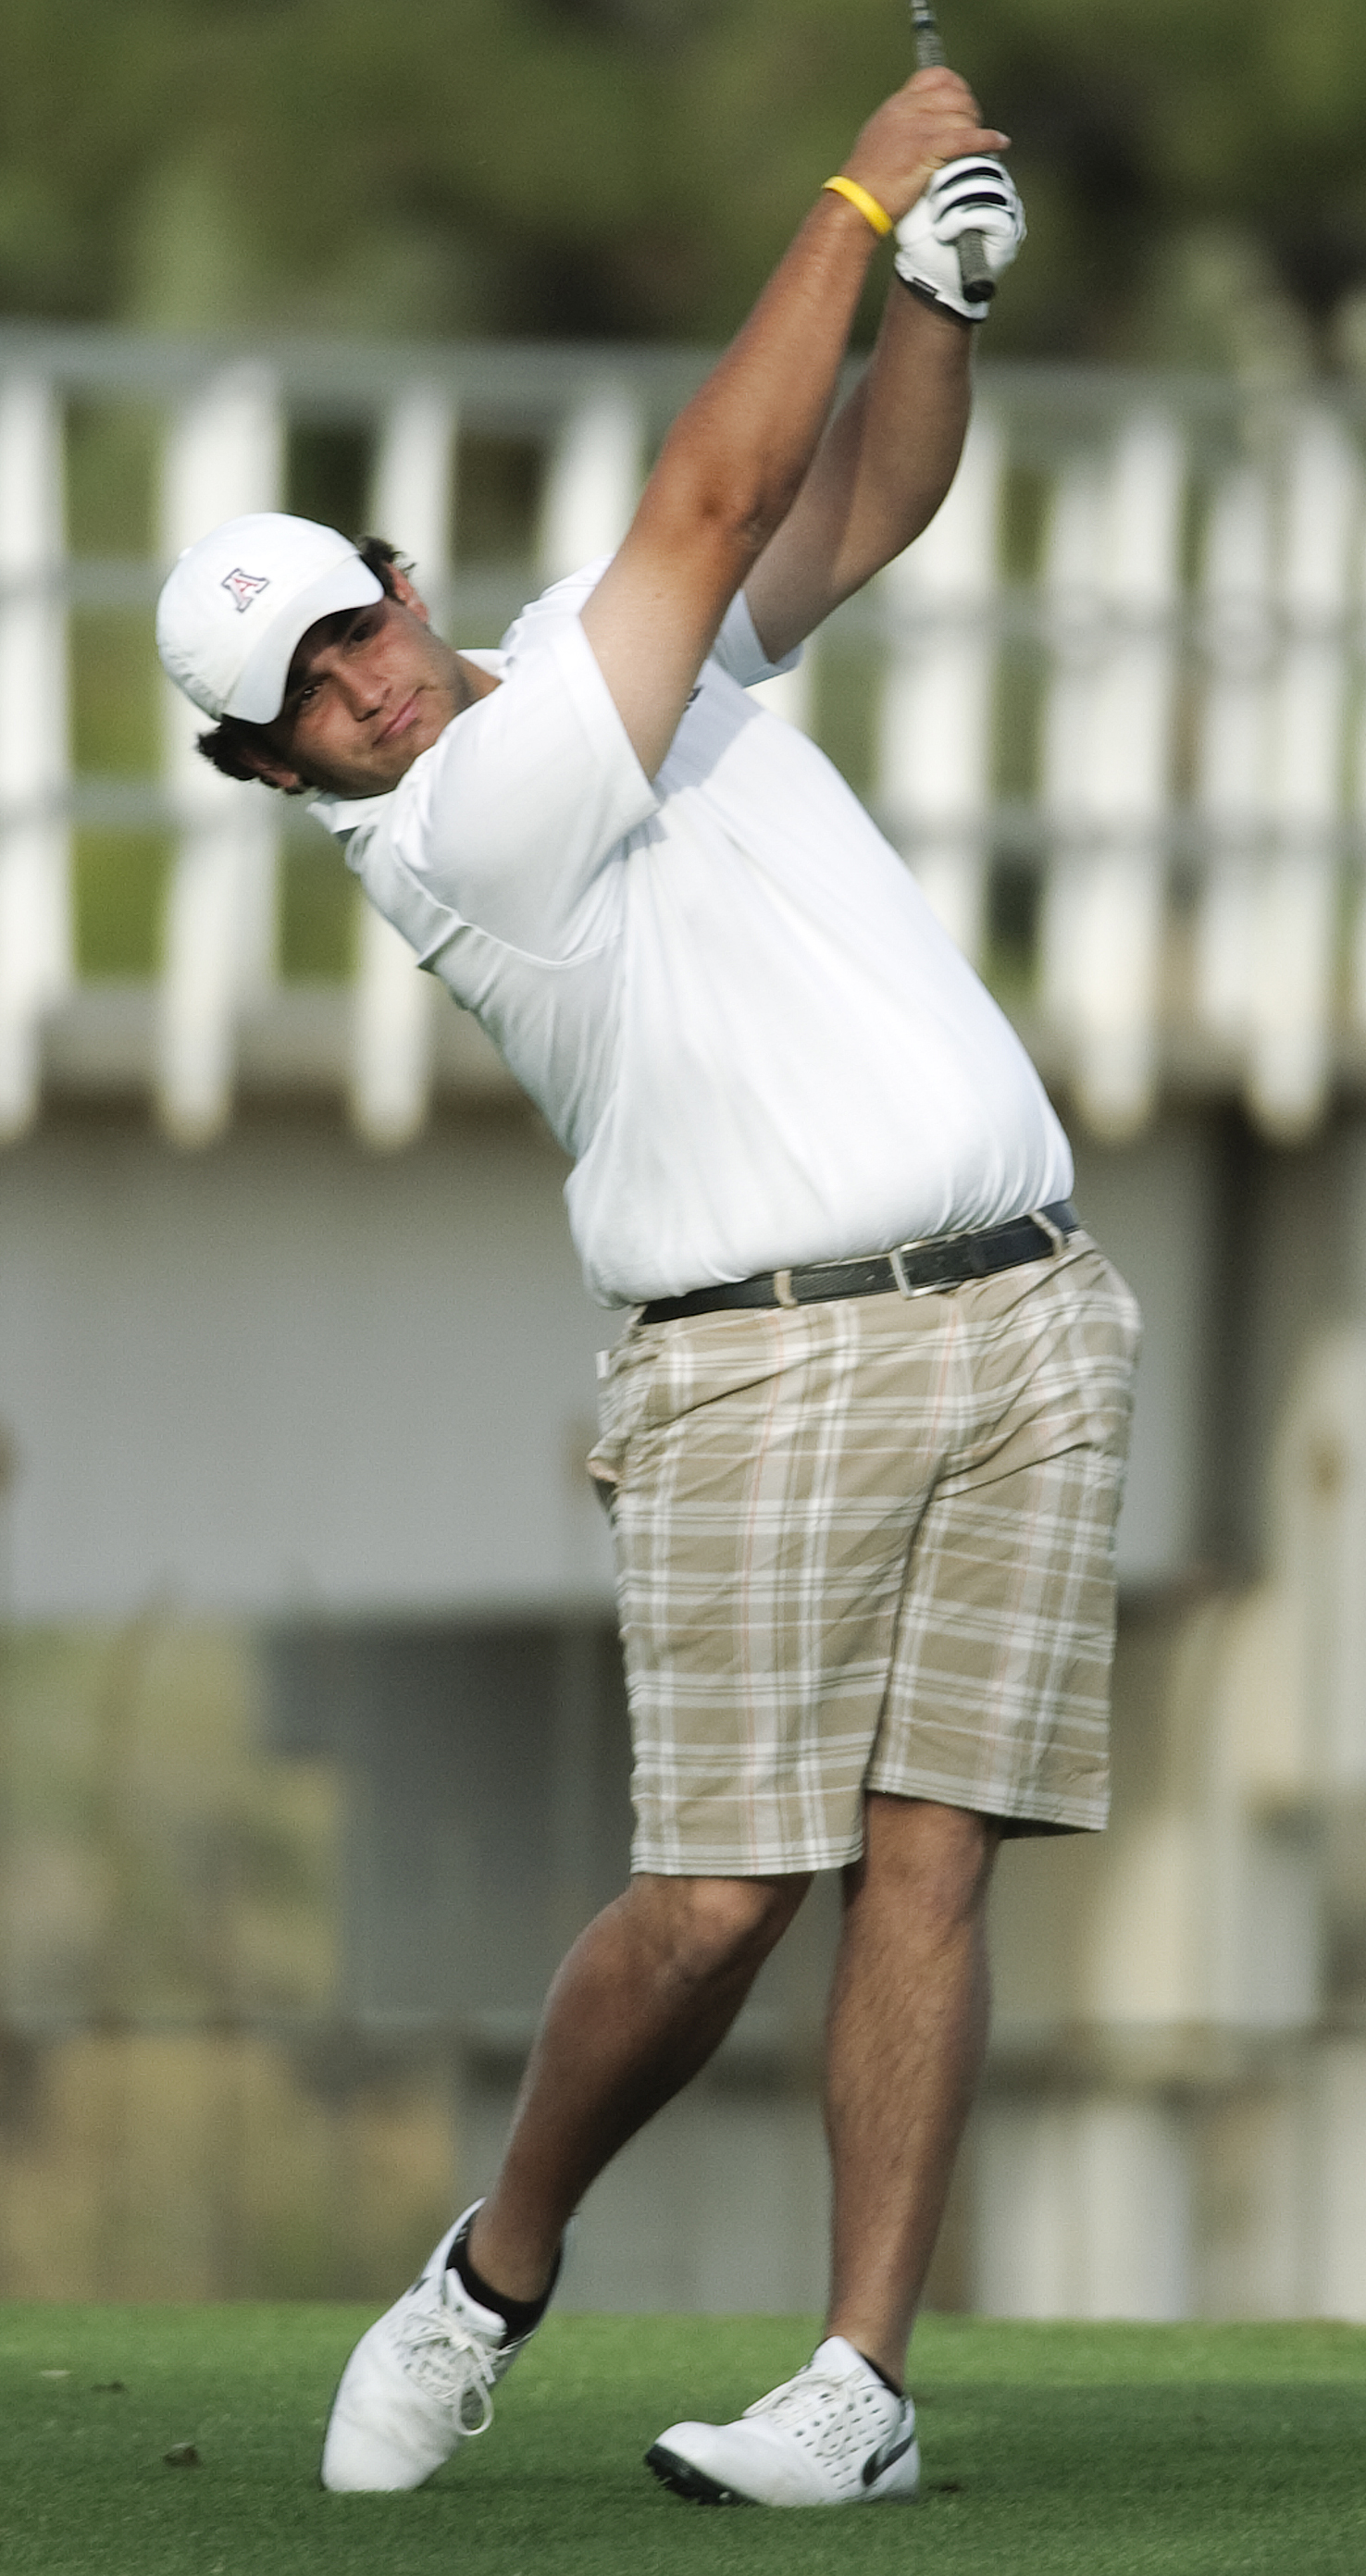 Arizona senior Rich Saferian won the Arizona Intercollegiate.